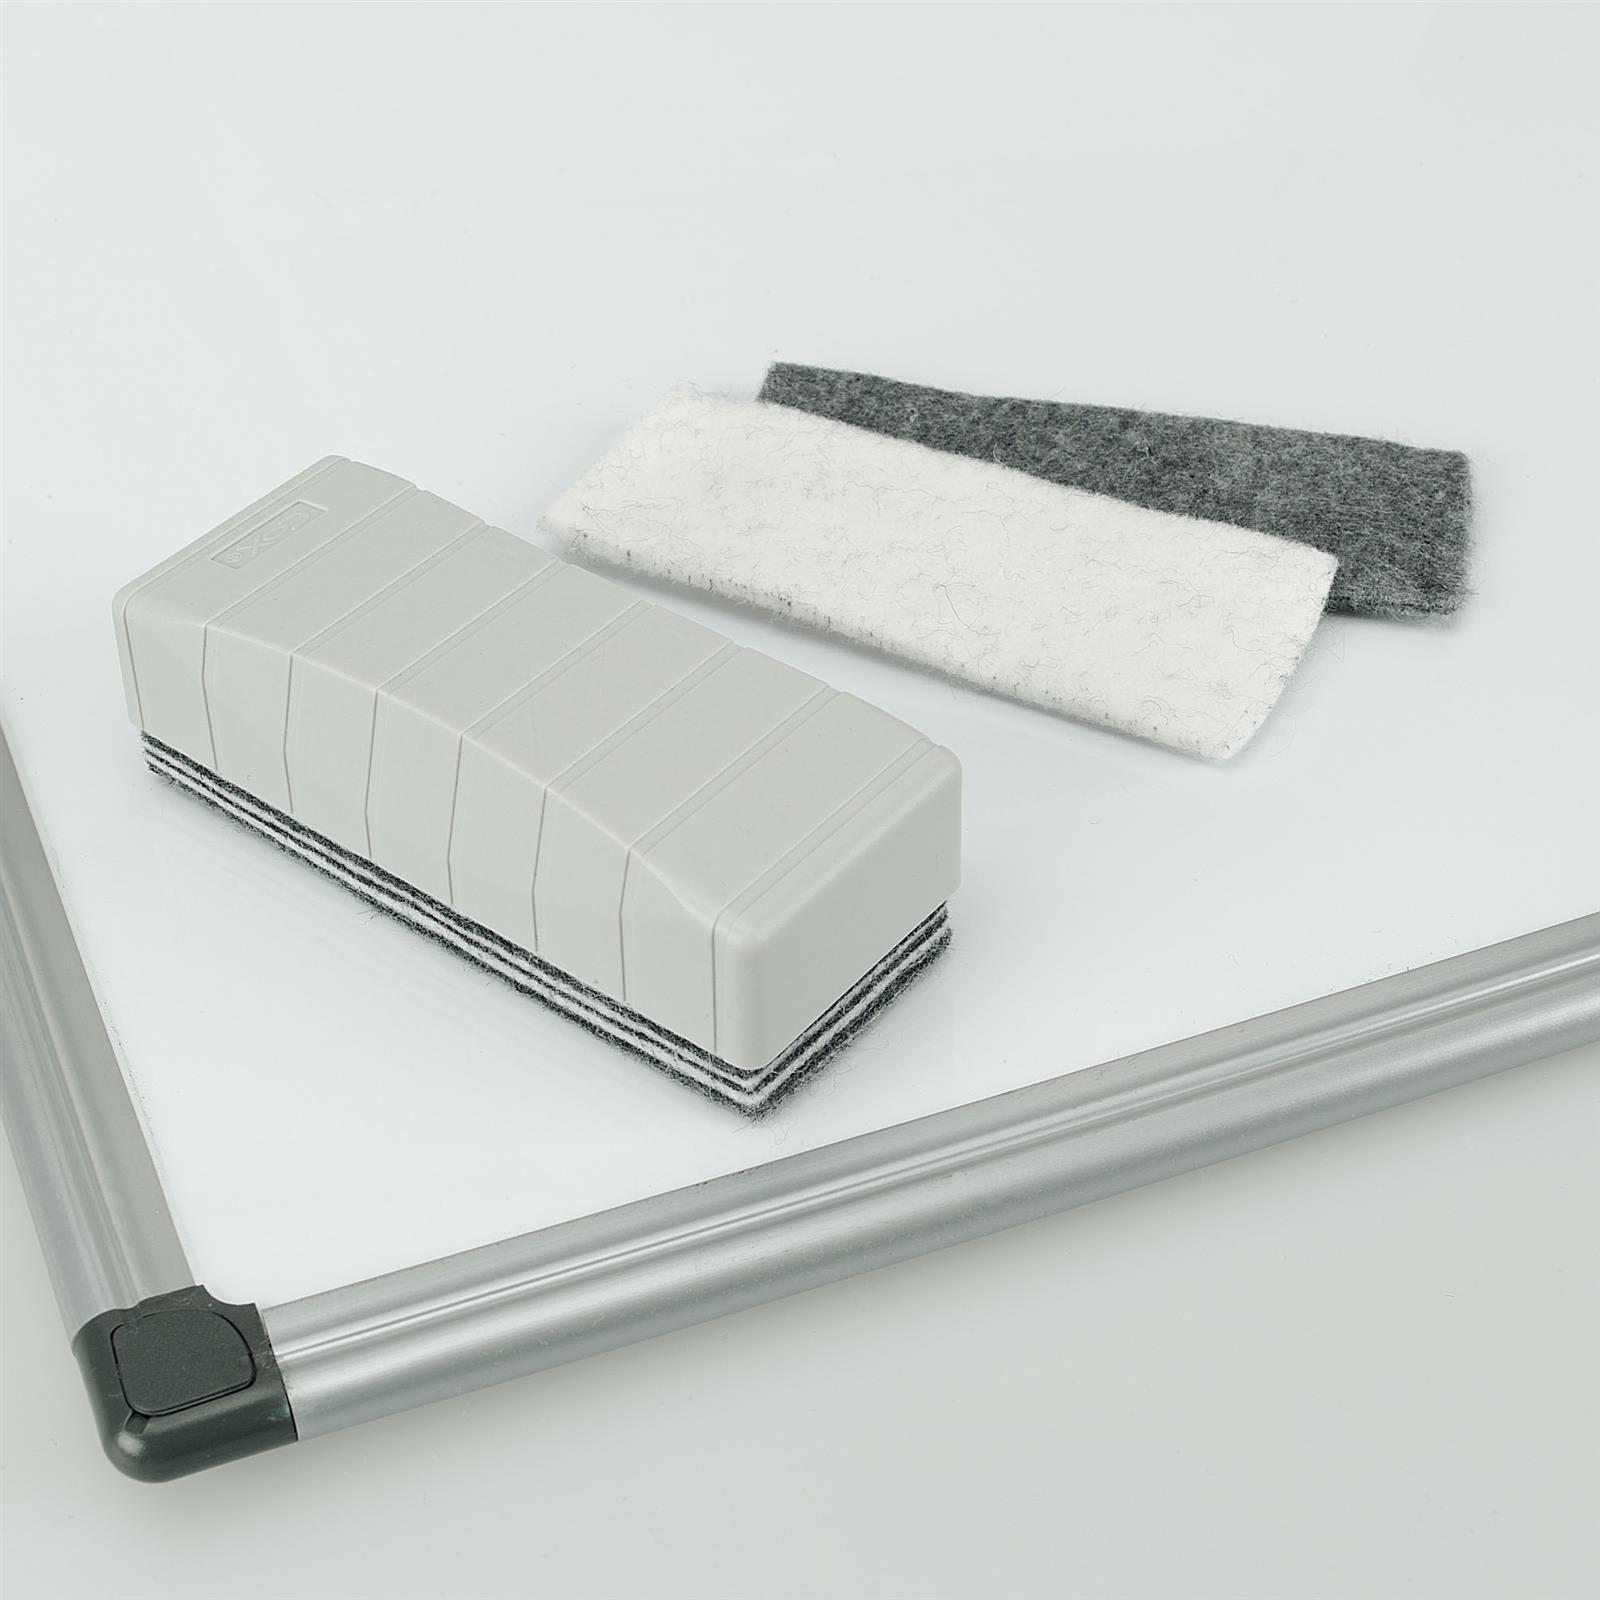 Whiteboard Erasers